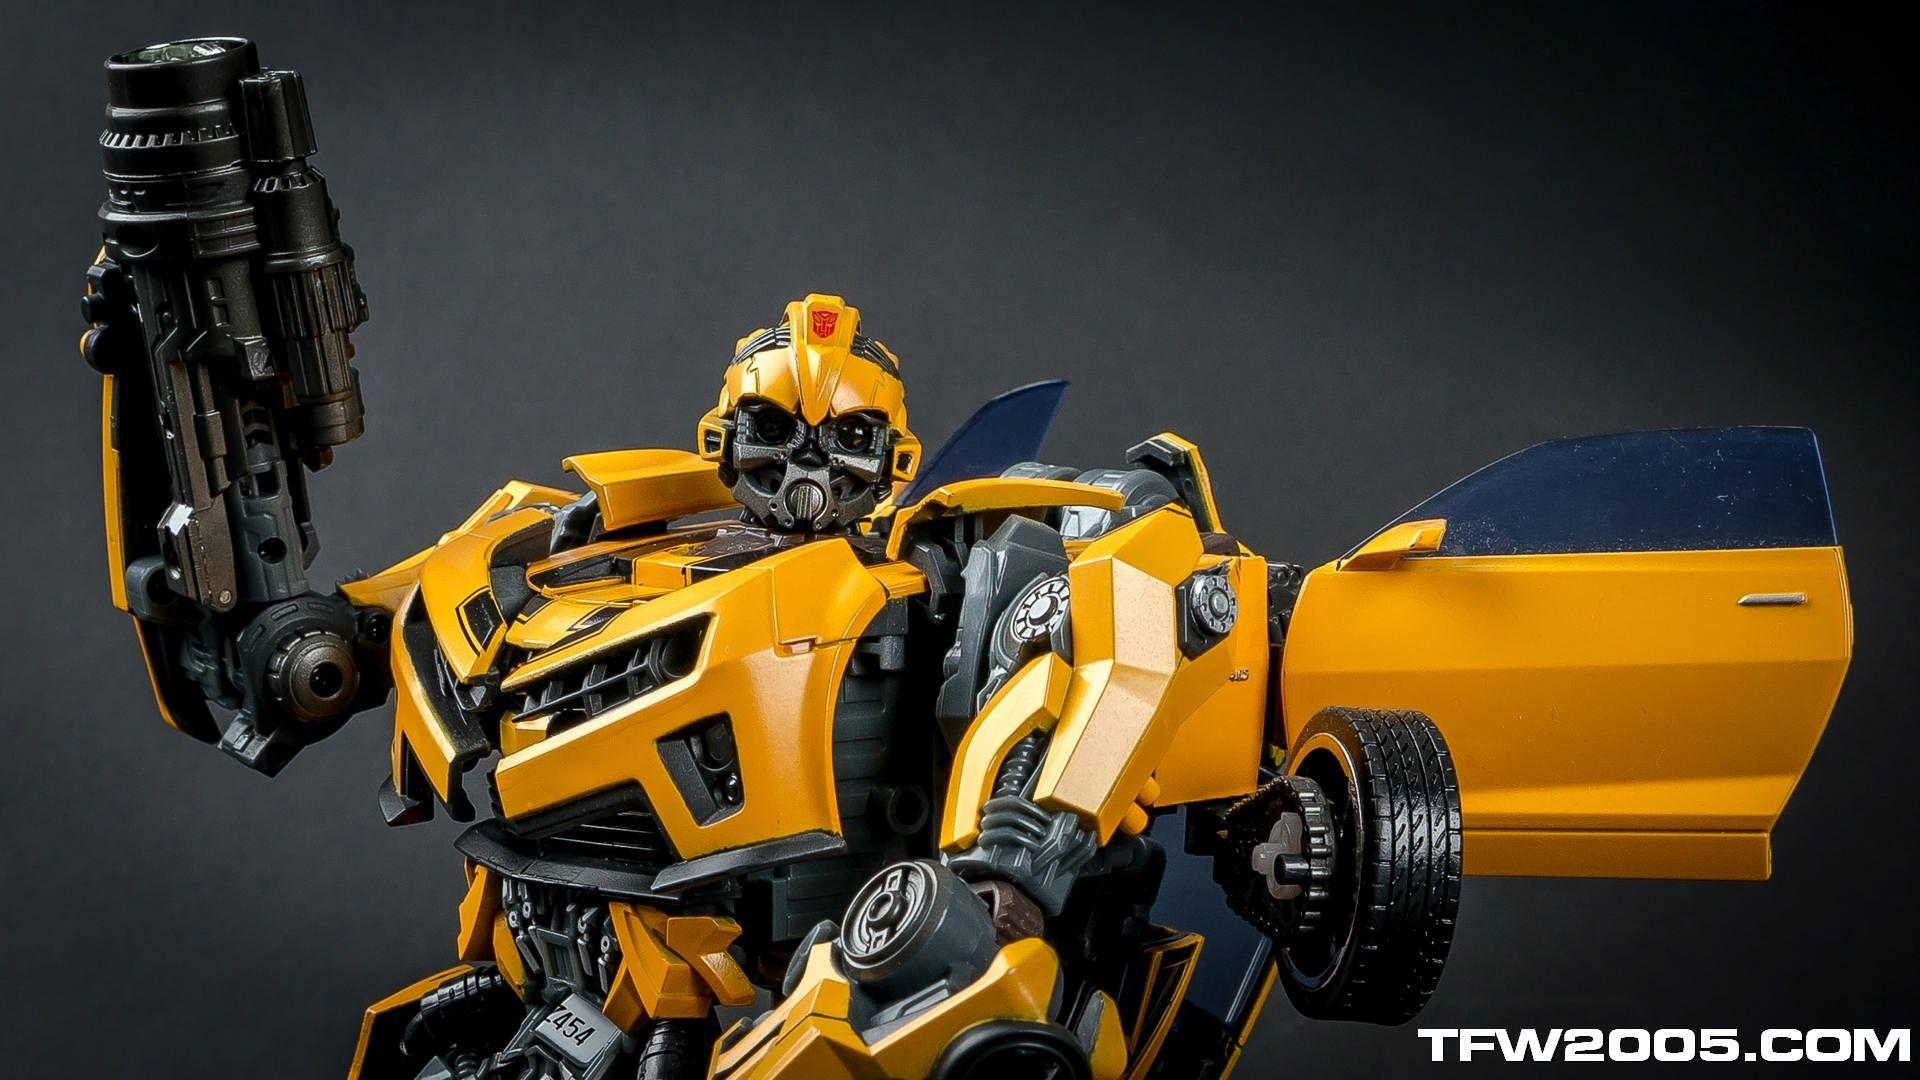 Res: 1920x1080, Transformers Bumblebee HD desktop wallpaper High Definition